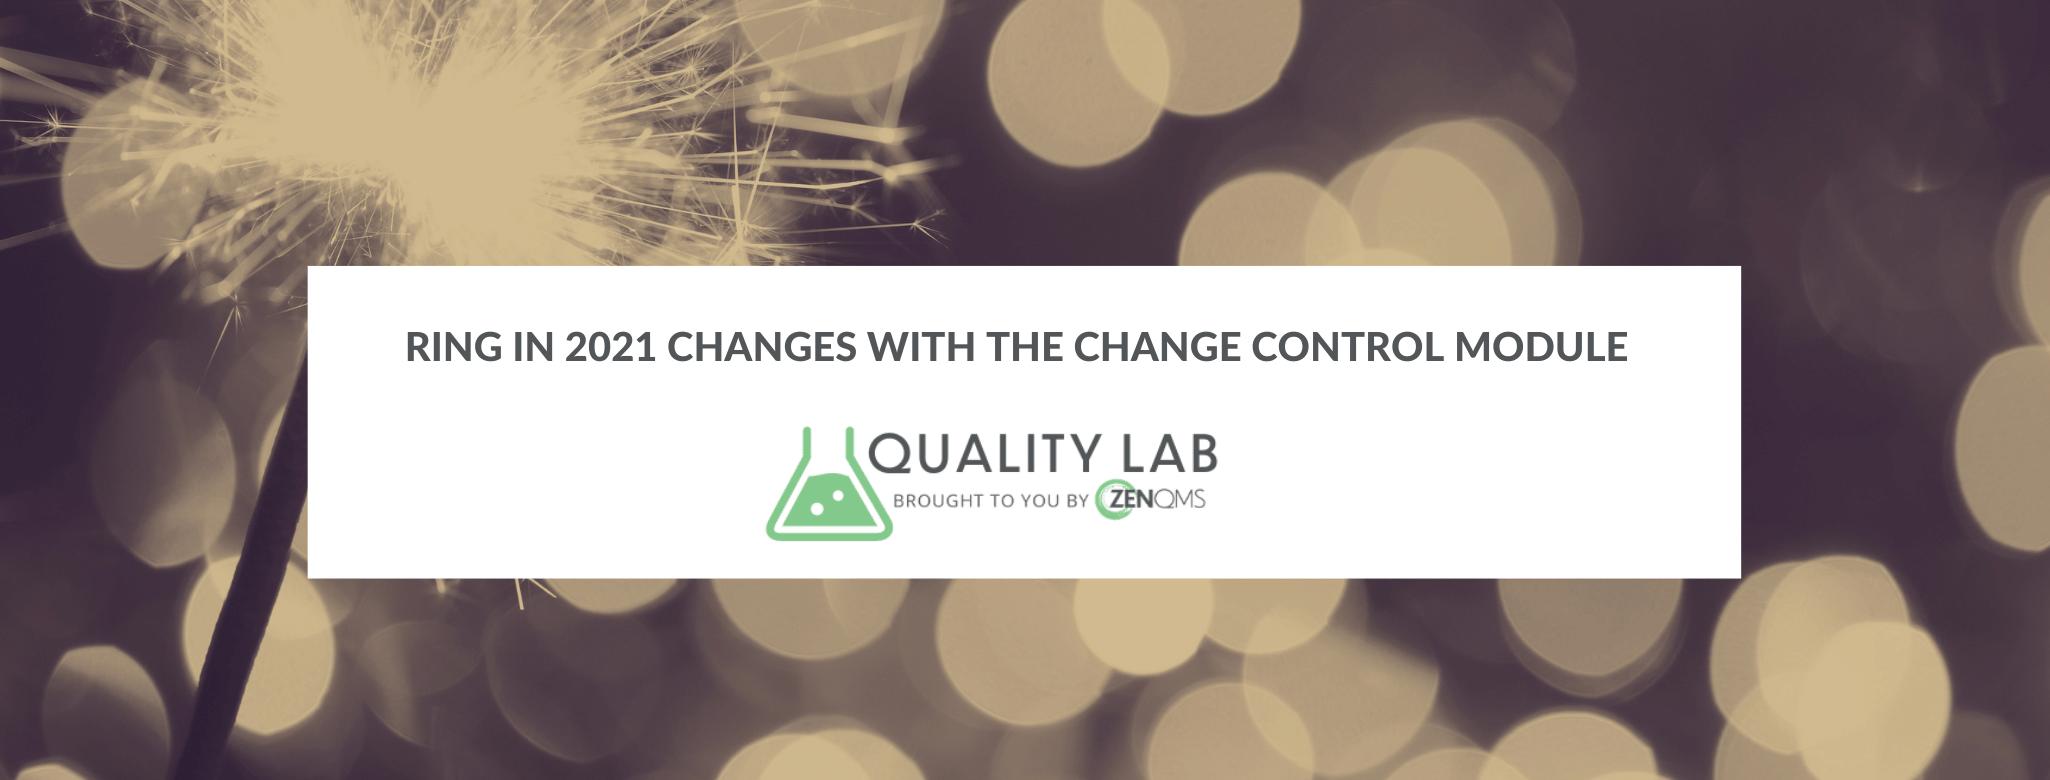 Quality Lab LP Header January 2021-1